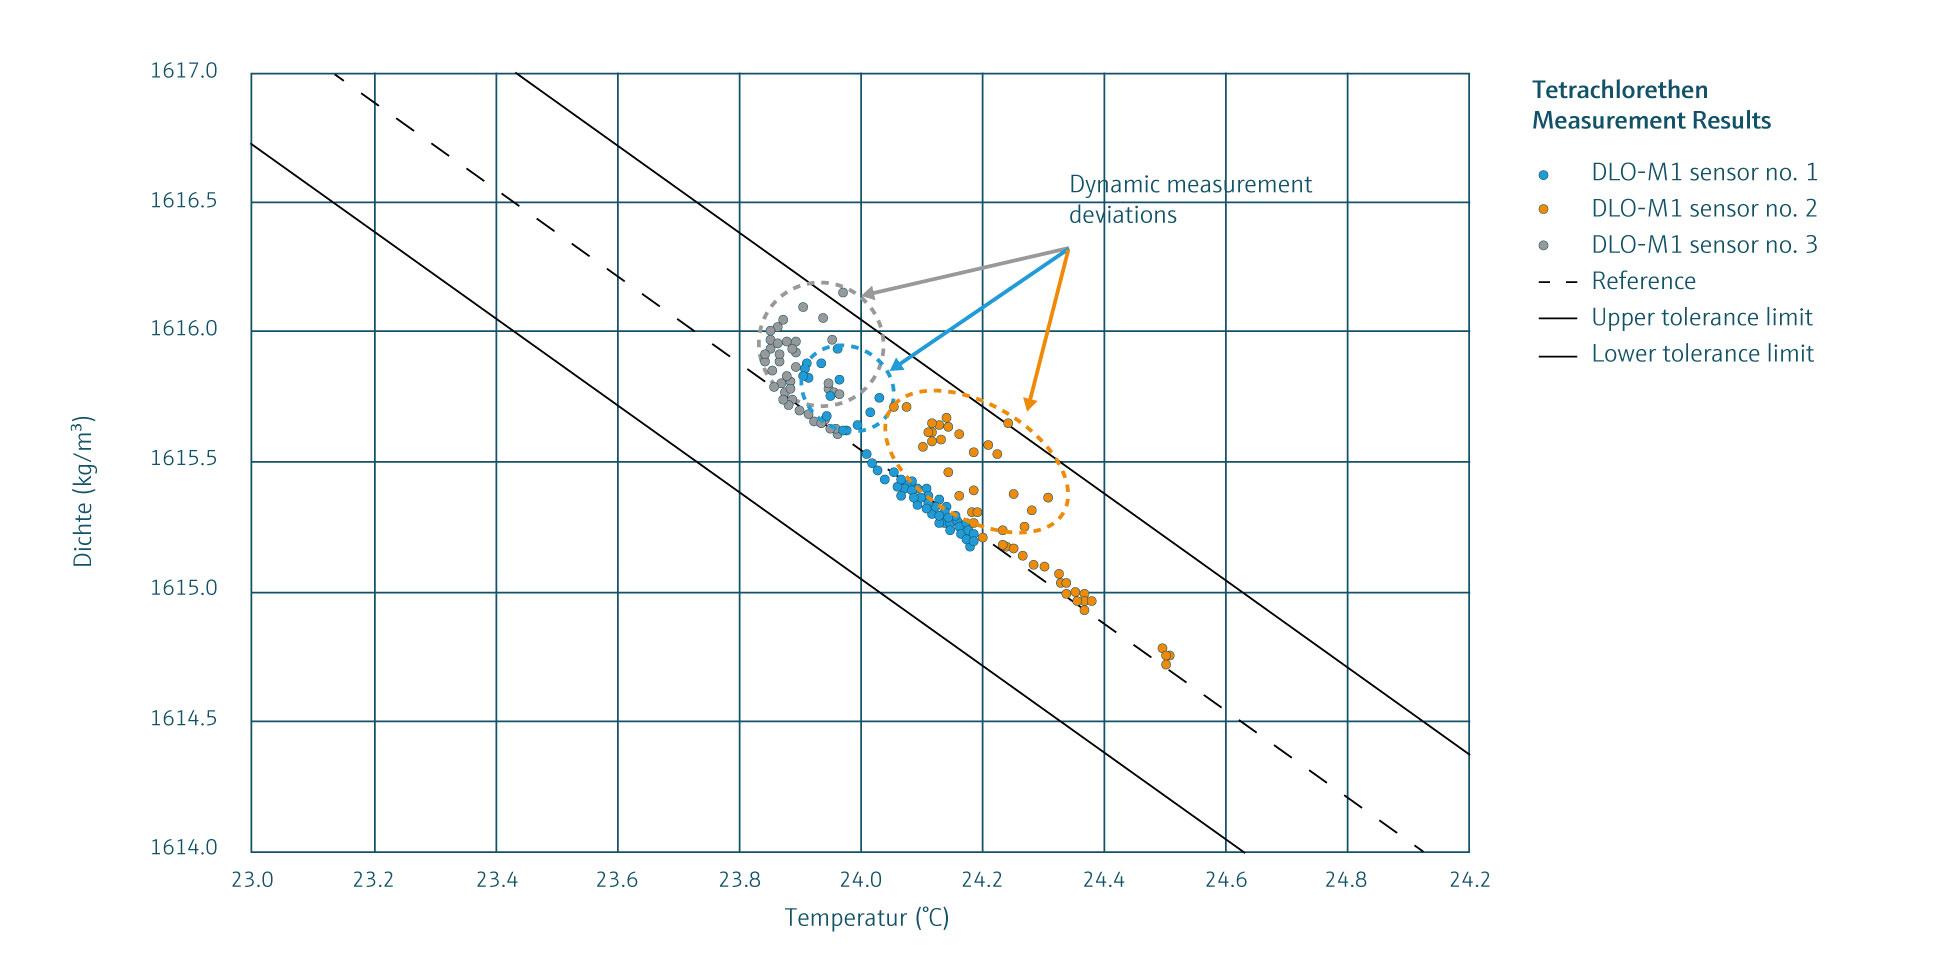 DLO Sensor - Tetrachloroethylene - Measurement results